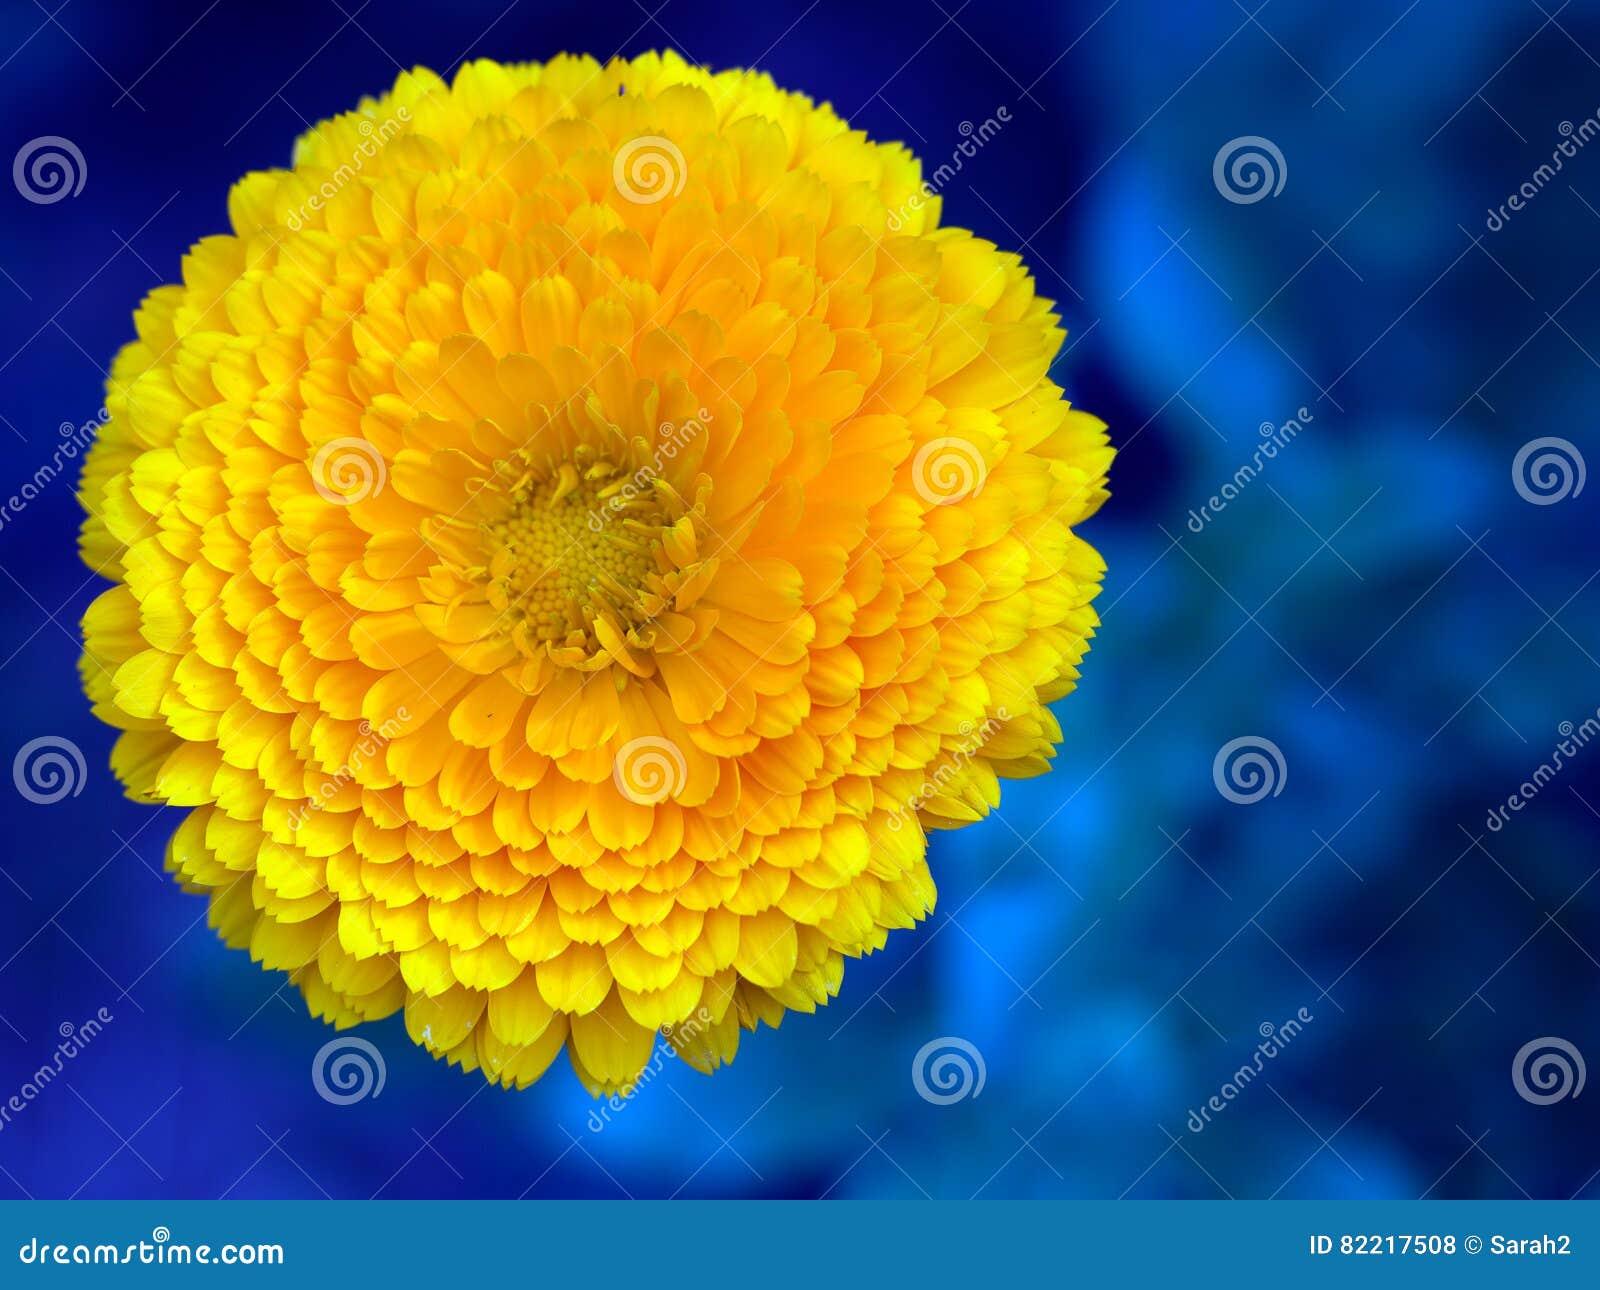 Bright Orange Pot Marigold Flower Against Blue Calendula Stock